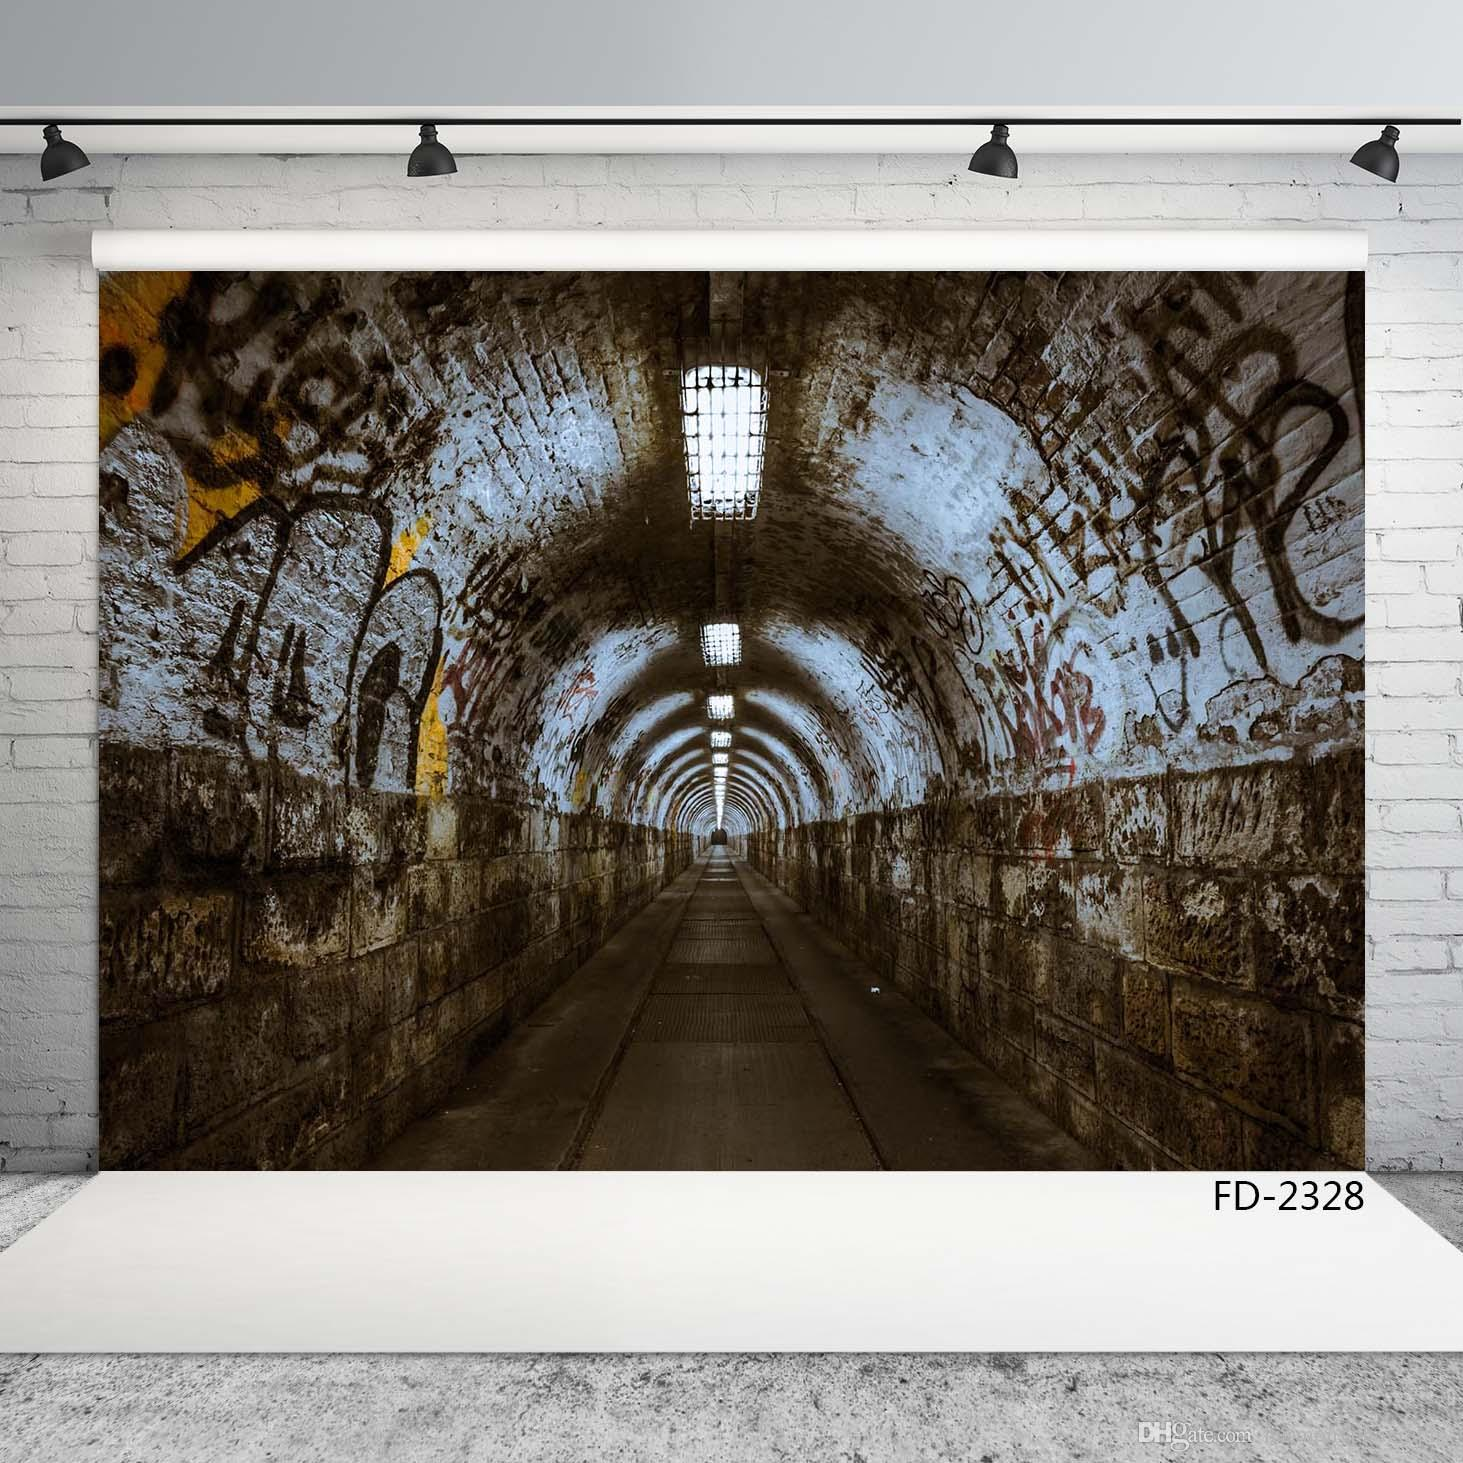 photographic backdrop vintage vintage graffiti tunnel backdrop for photo shoot 7X5ft vinyl cloth backdrops for photo studio camera photo